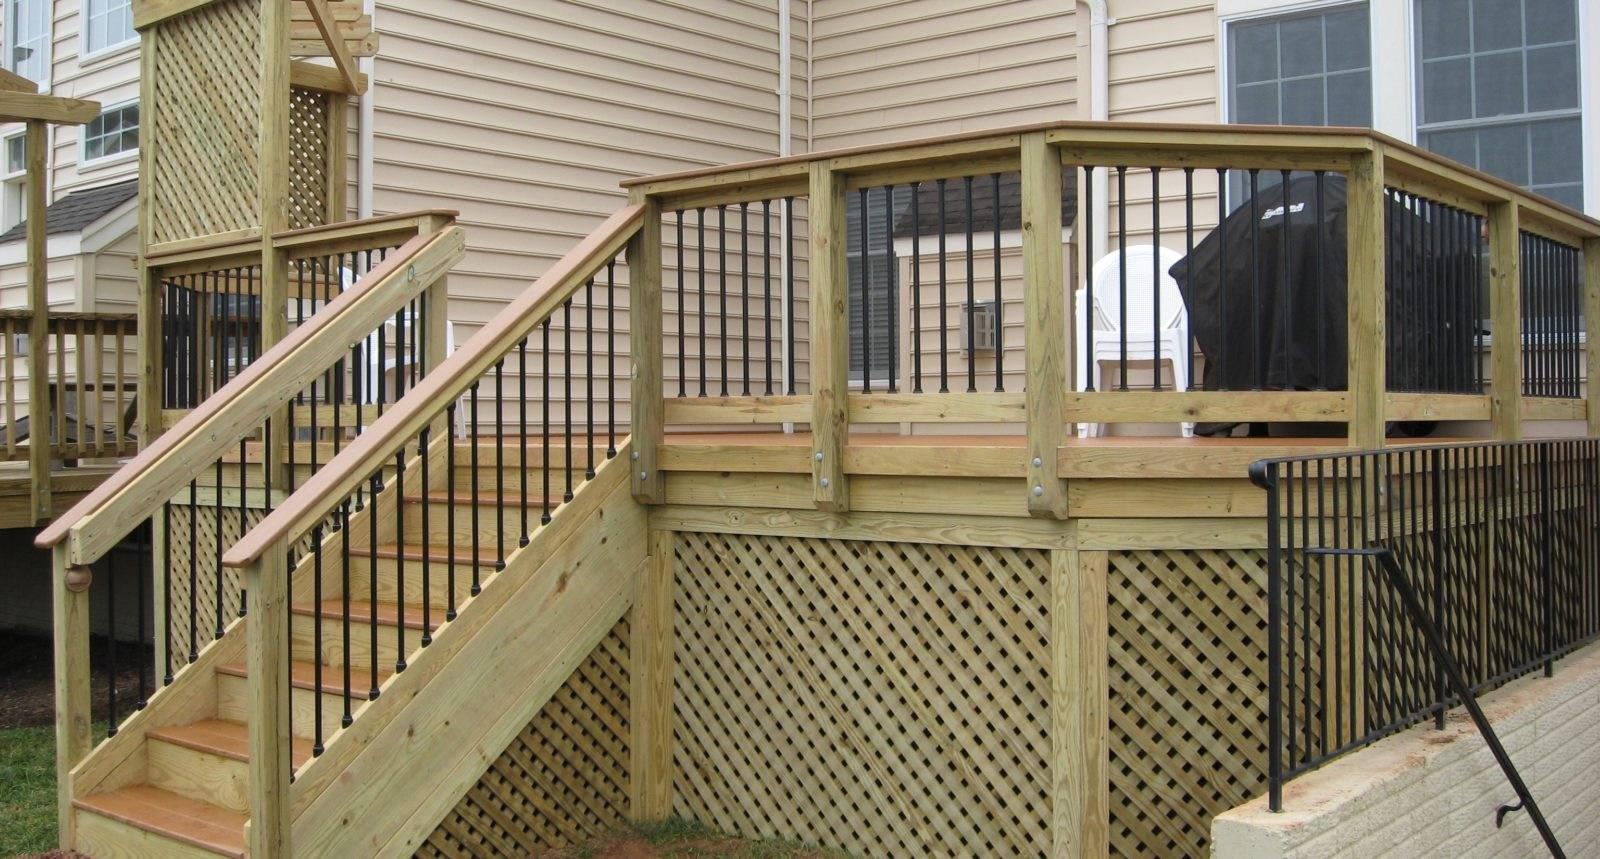 Deck Builder In Loudoun County Loudoun Deck Fence | Pressure Treated Stair Handrail | Sturdy | Step | Deck Rail | Long Deck | Treated Lumber